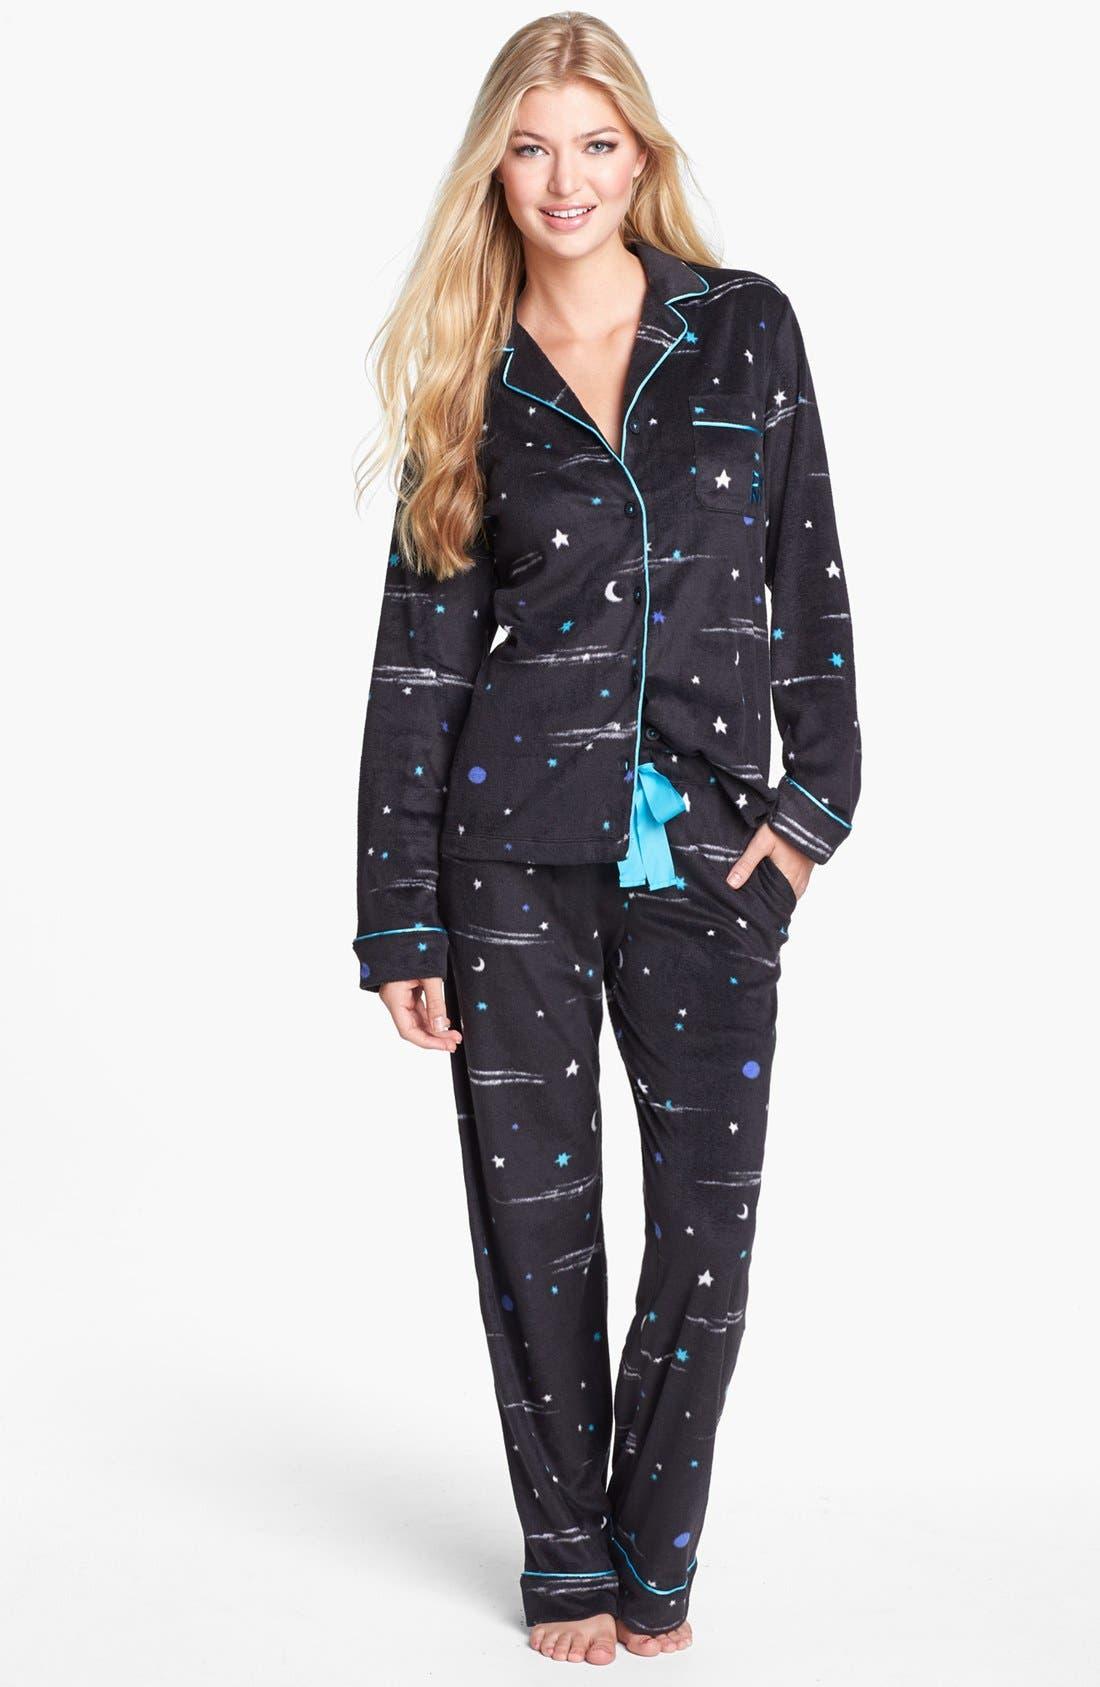 Alternate Image 1 Selected - DKNY 'Wish List' Fleece Pajamas